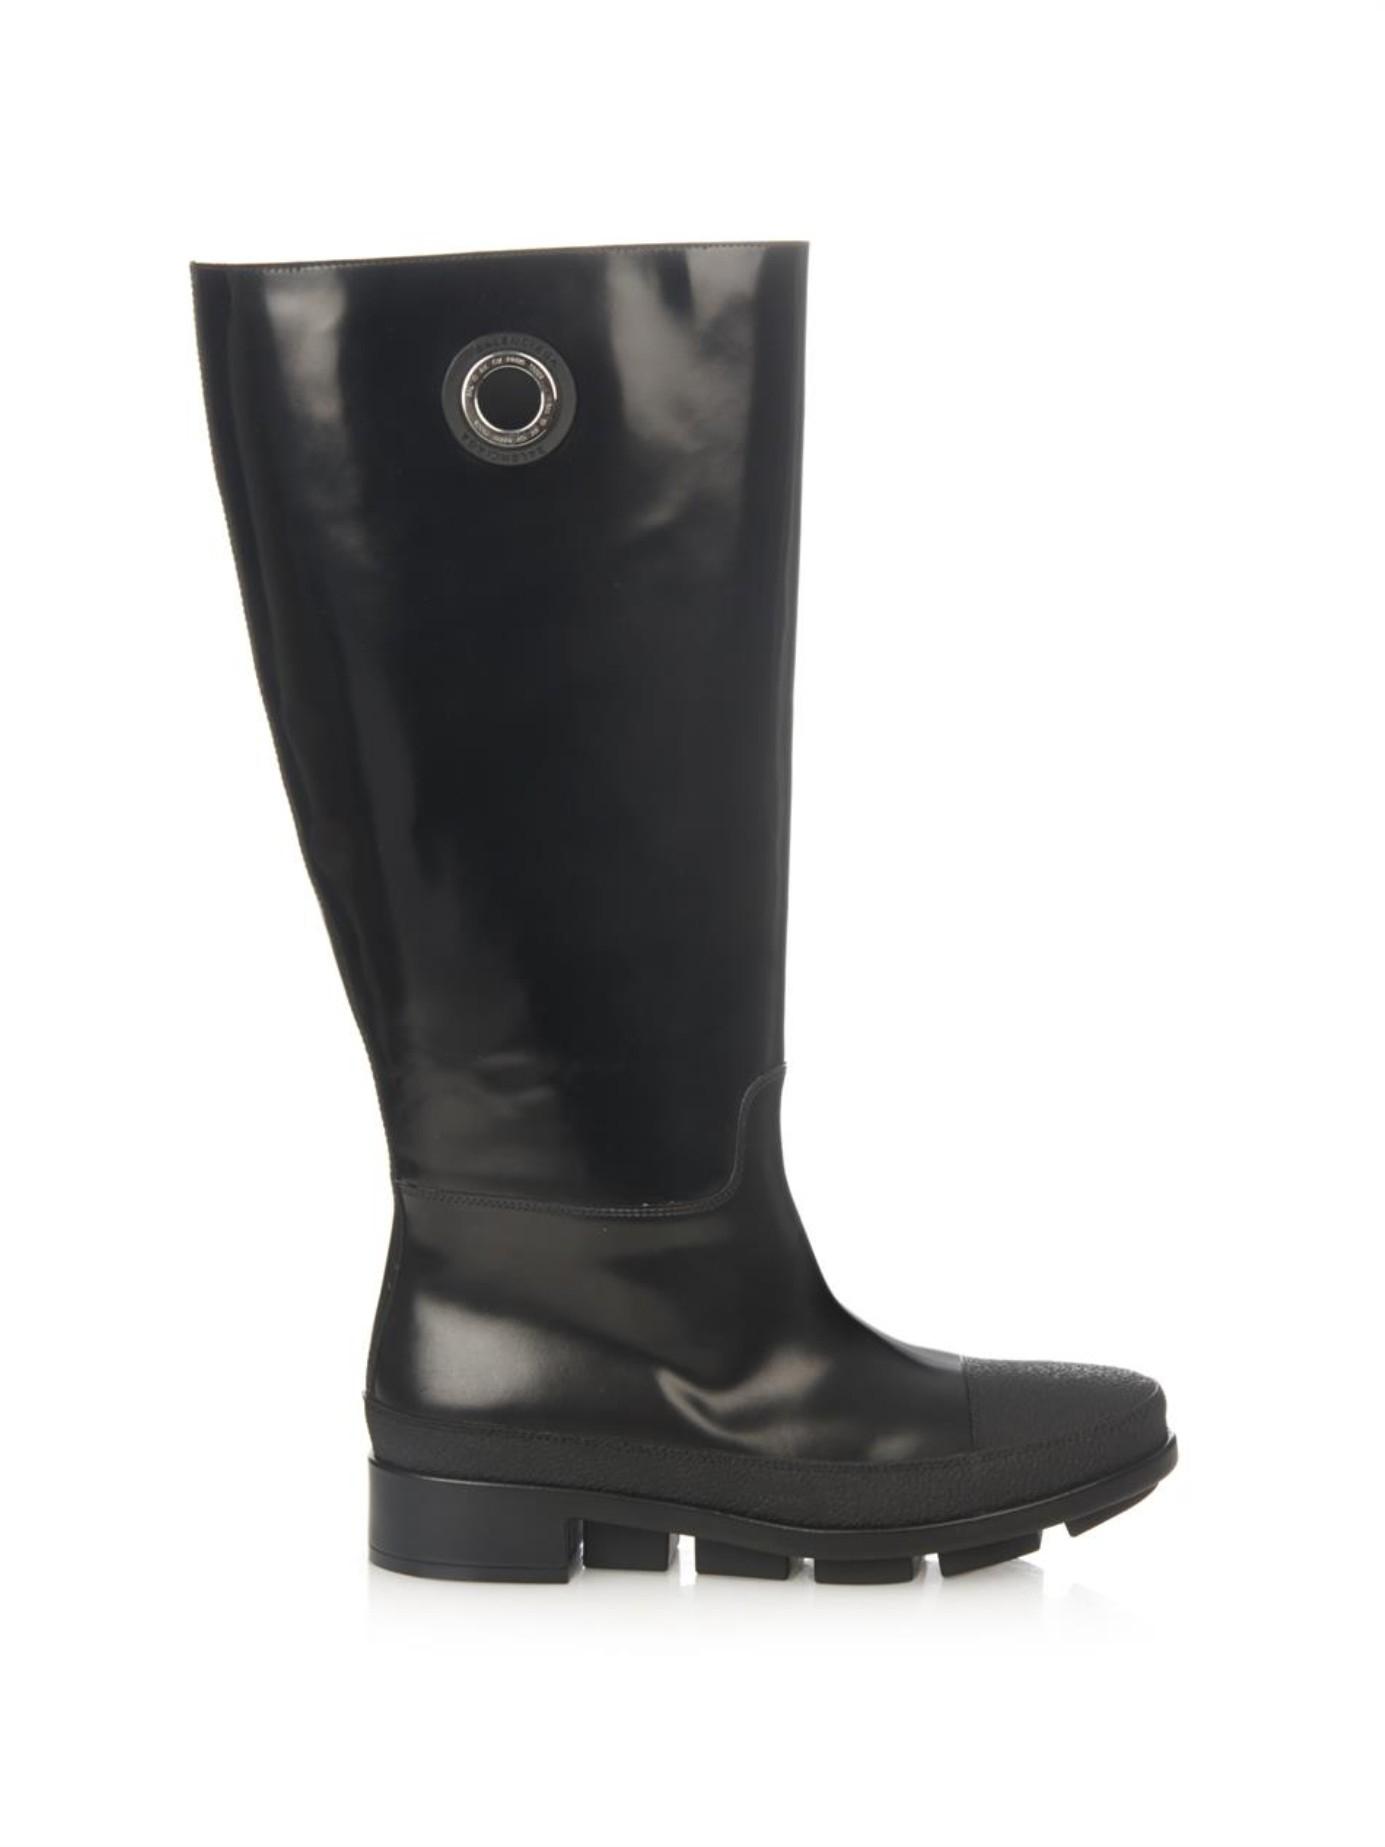 Balenciaga River Leather Rain Boots in Black | Lyst